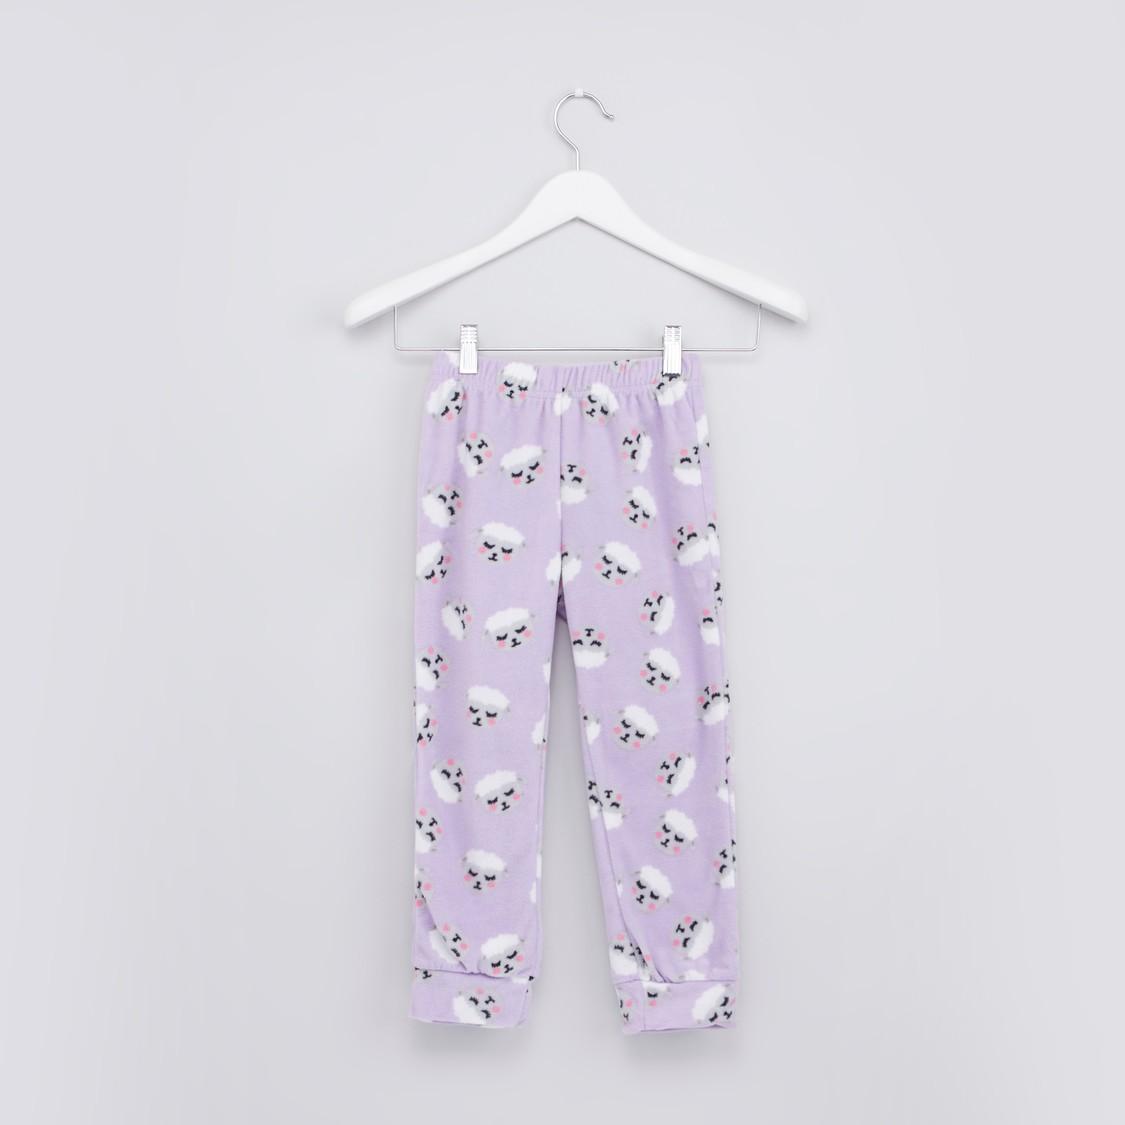 Printed T-shirt with Long Sleeves and Full Length Jog Pants